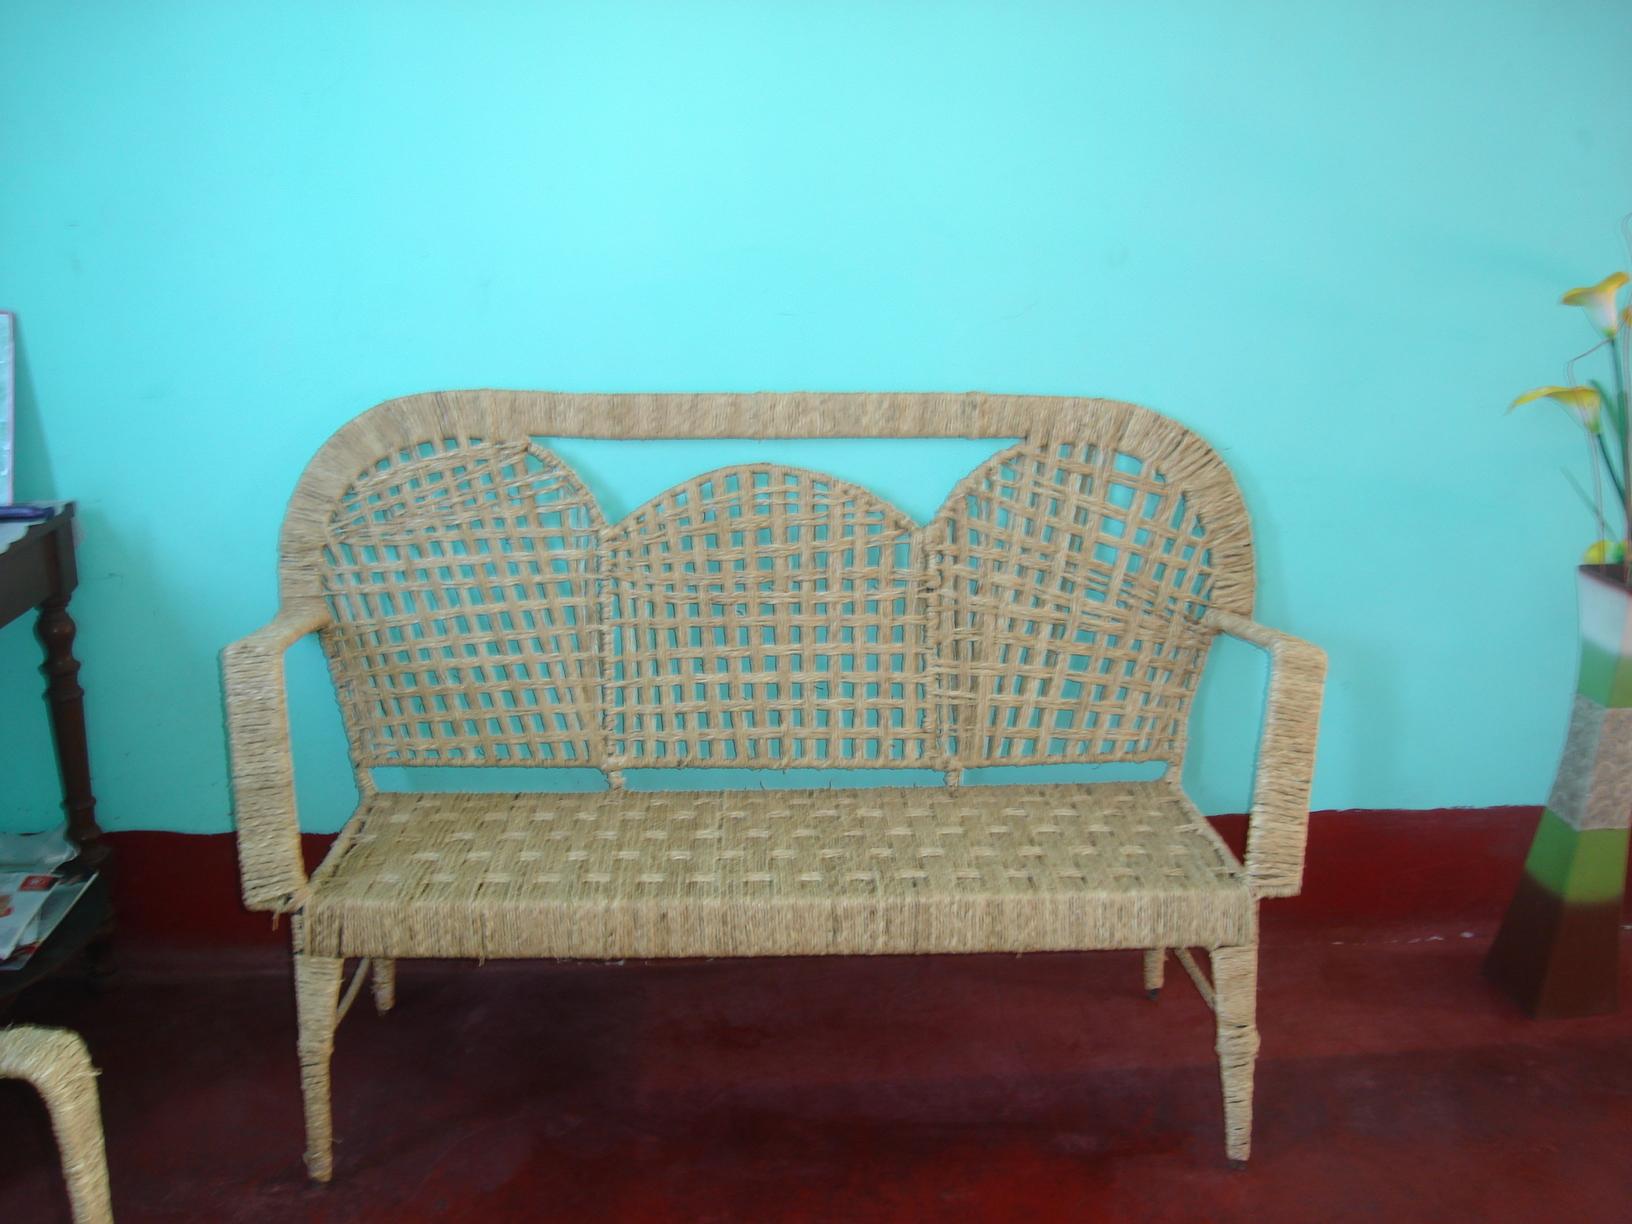 Muebles de Junco en Oferta, 500 soles - elPiquero.com